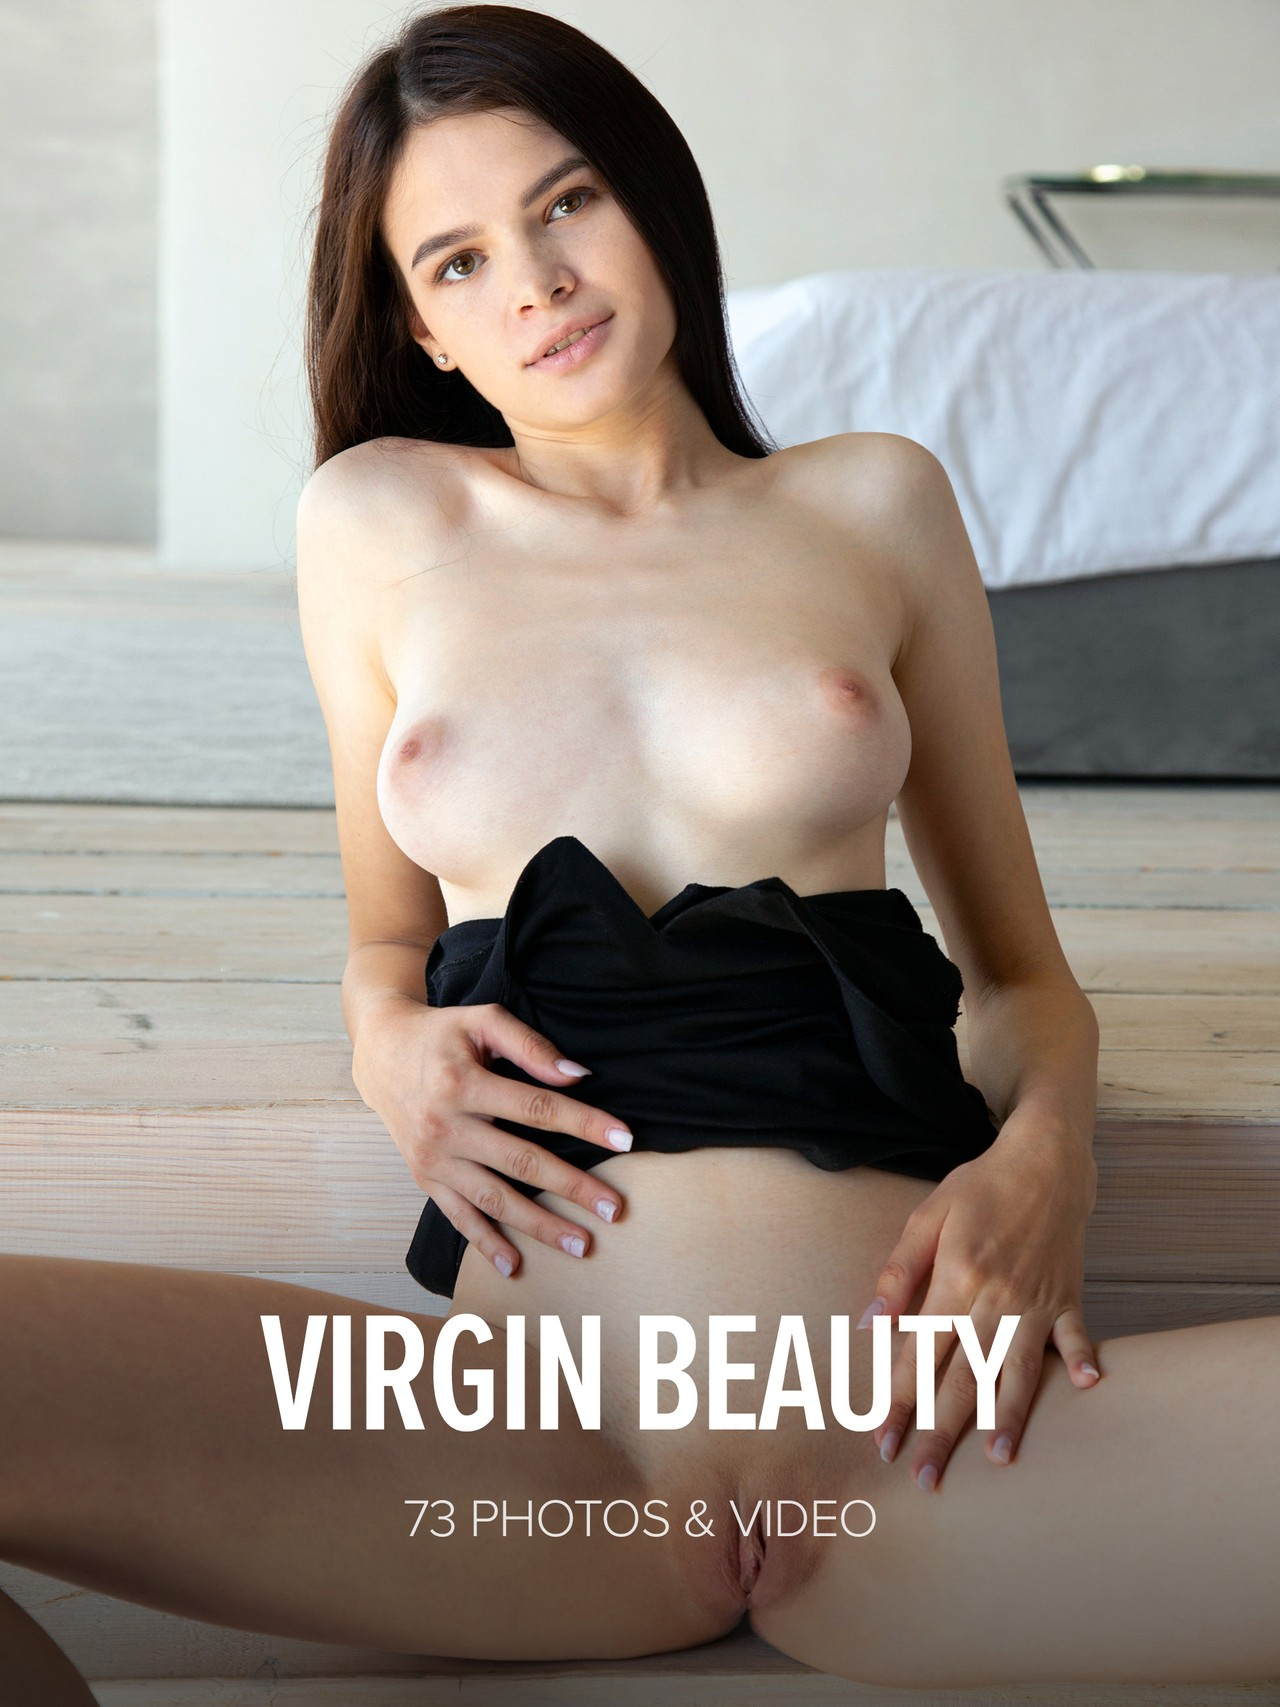 Lilly: Virgin Beauty